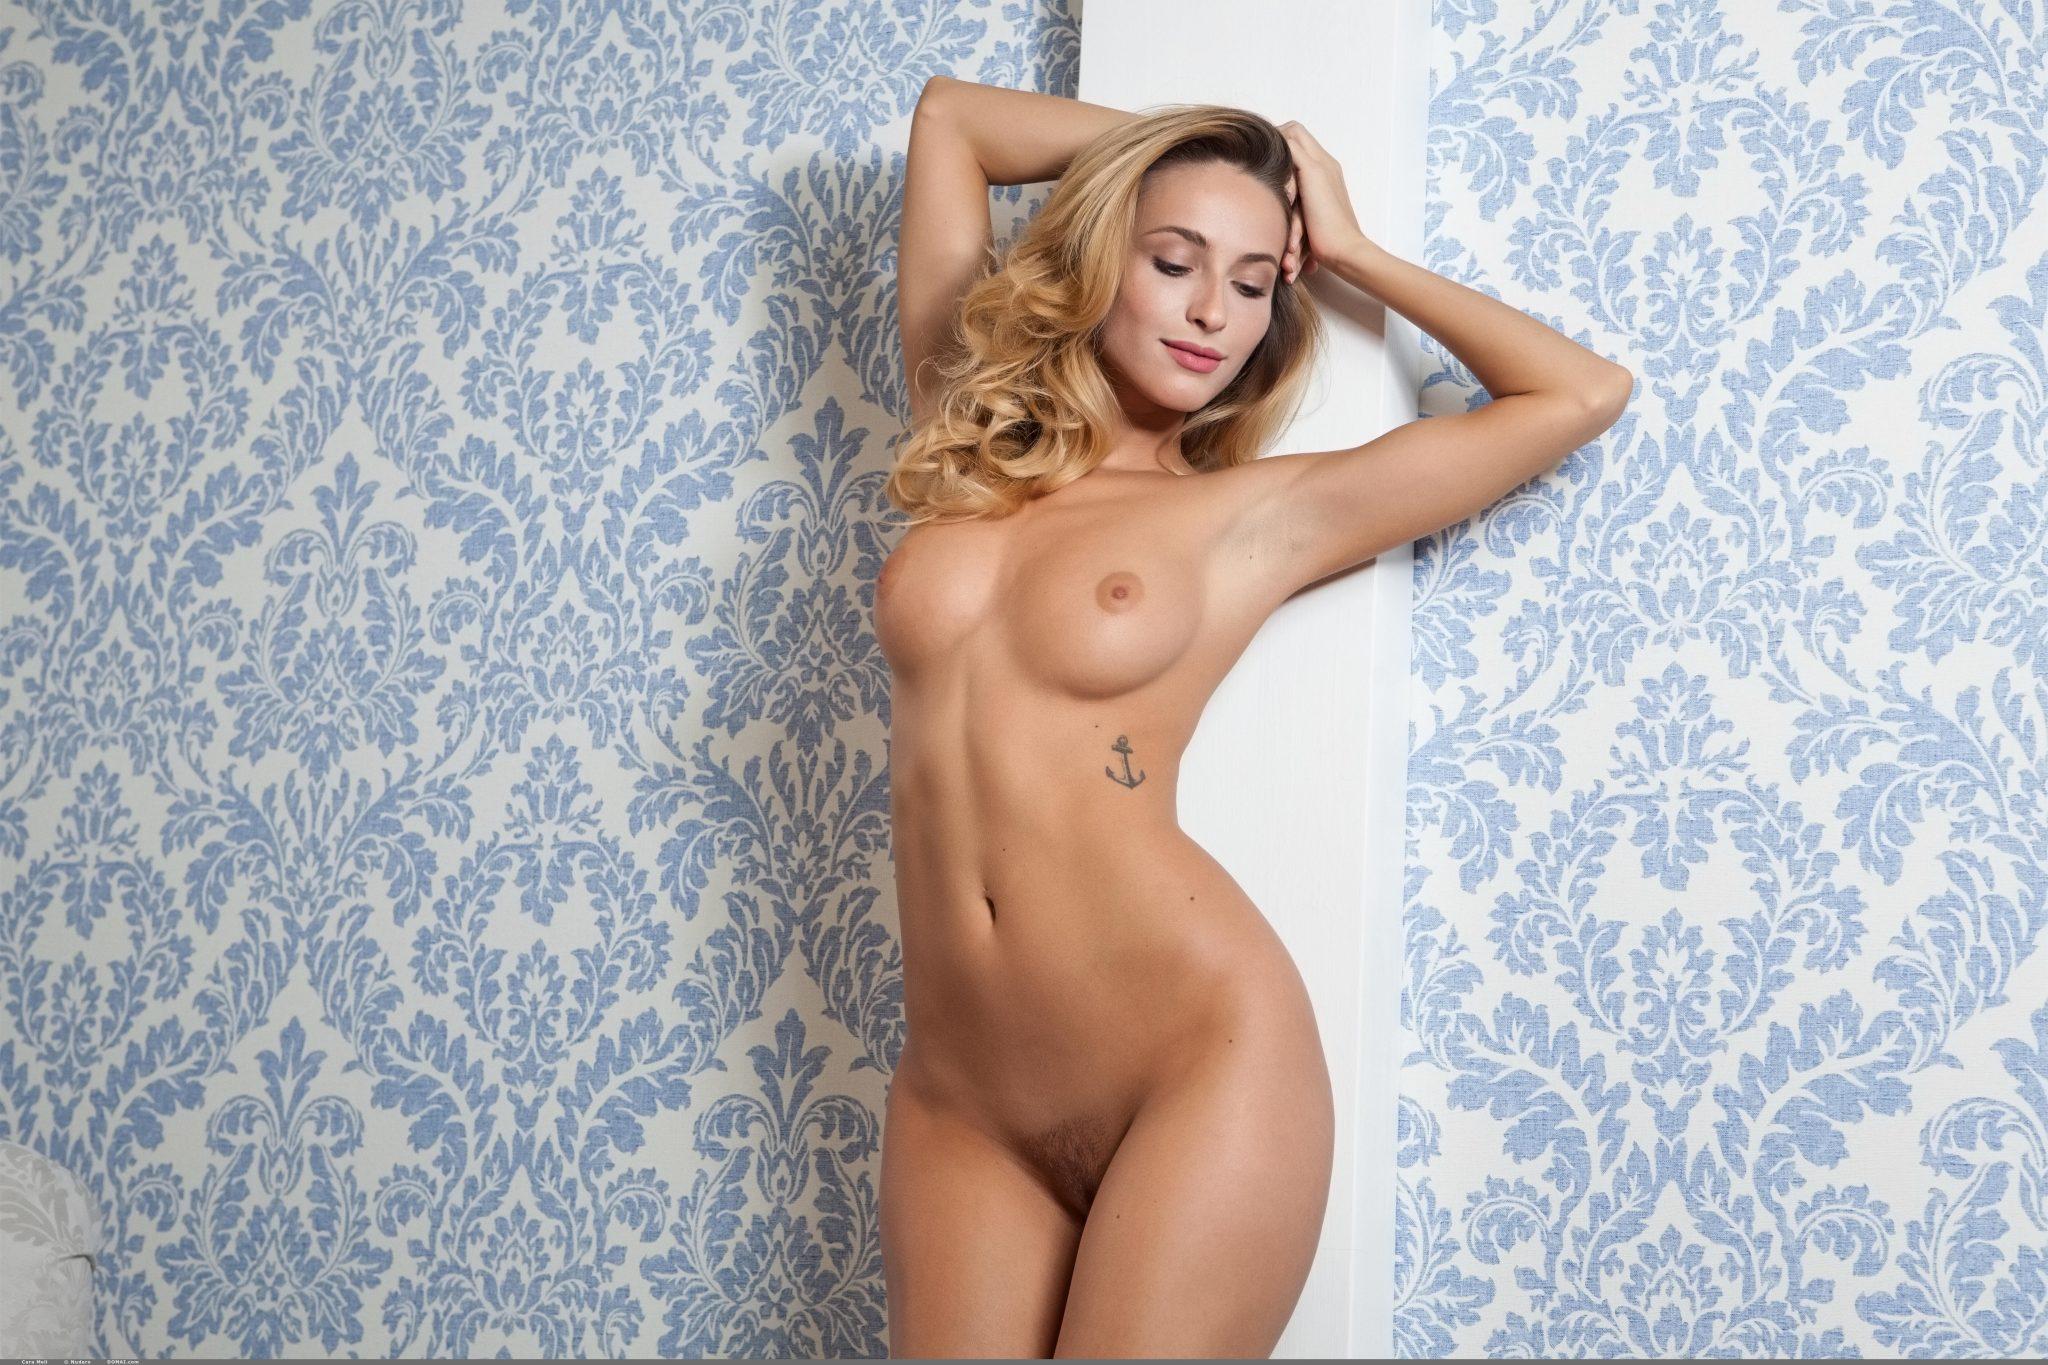 Catalina larranga naked